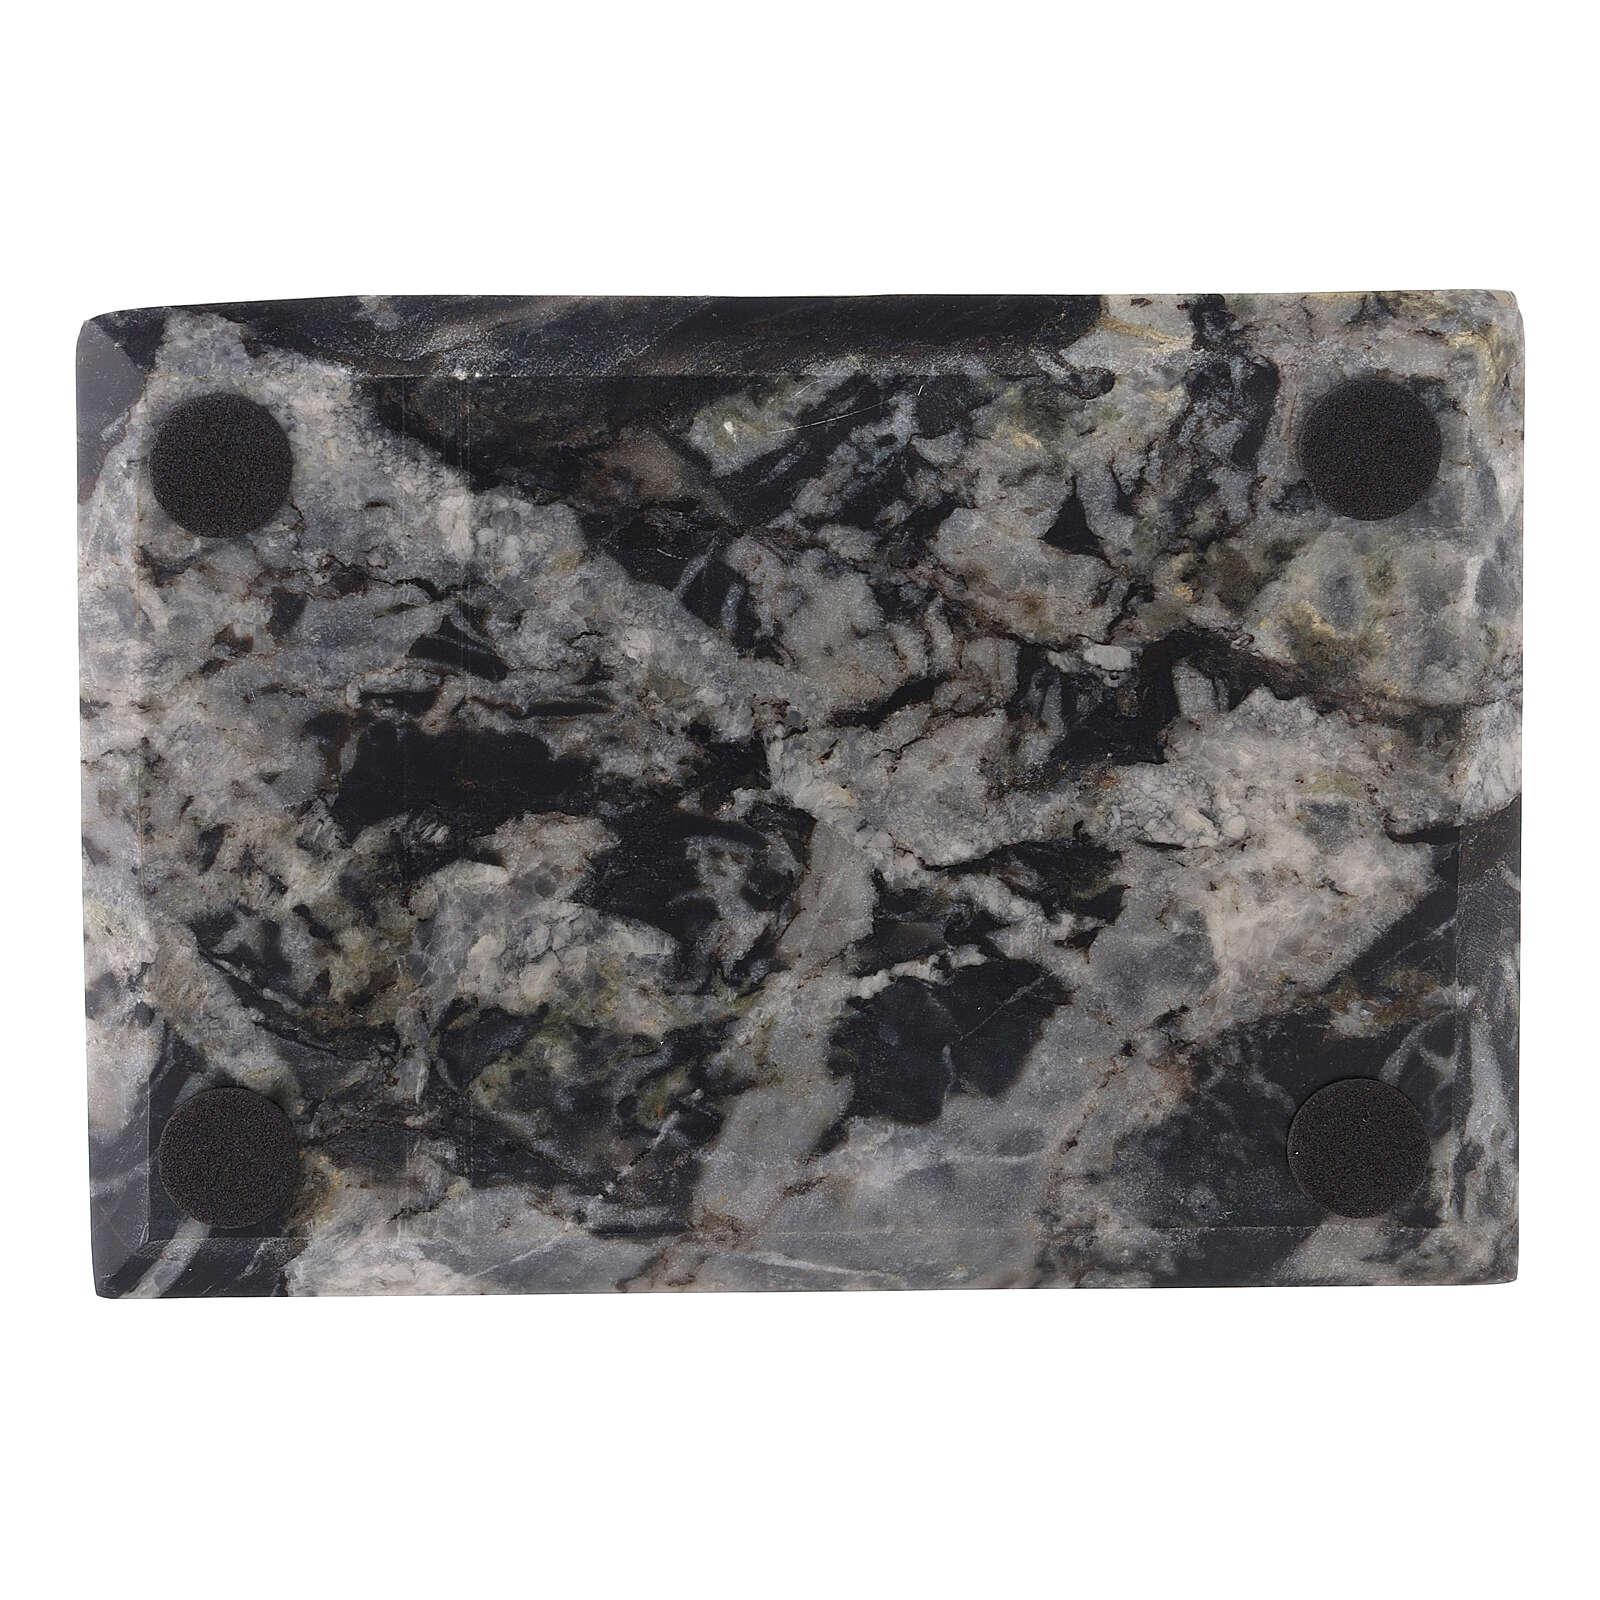 Portavela plato rectangular 20x14 piedra 3